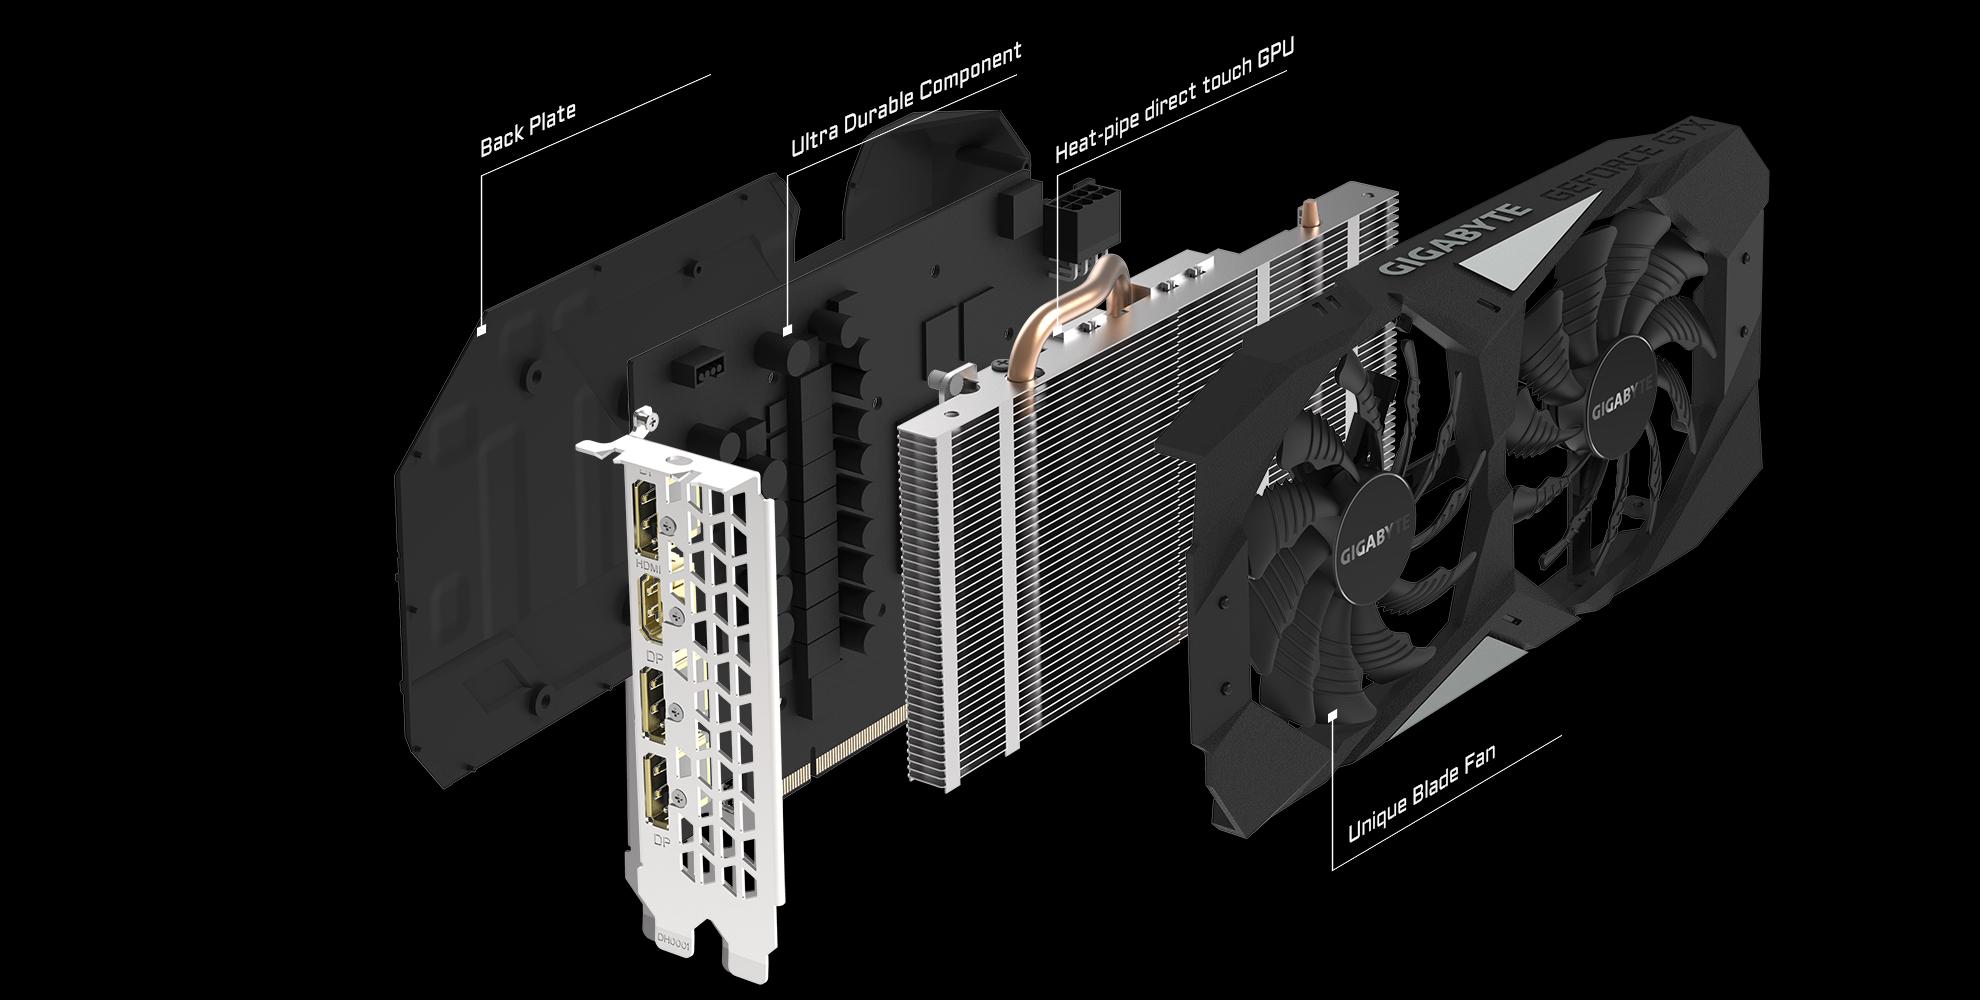 2X Windforce Fans Gigabyte GeForce GTX 1660 OC 6G Graphics Card Gv-N1660OC-6GD Video Card 6GB 192-bit GDDR5